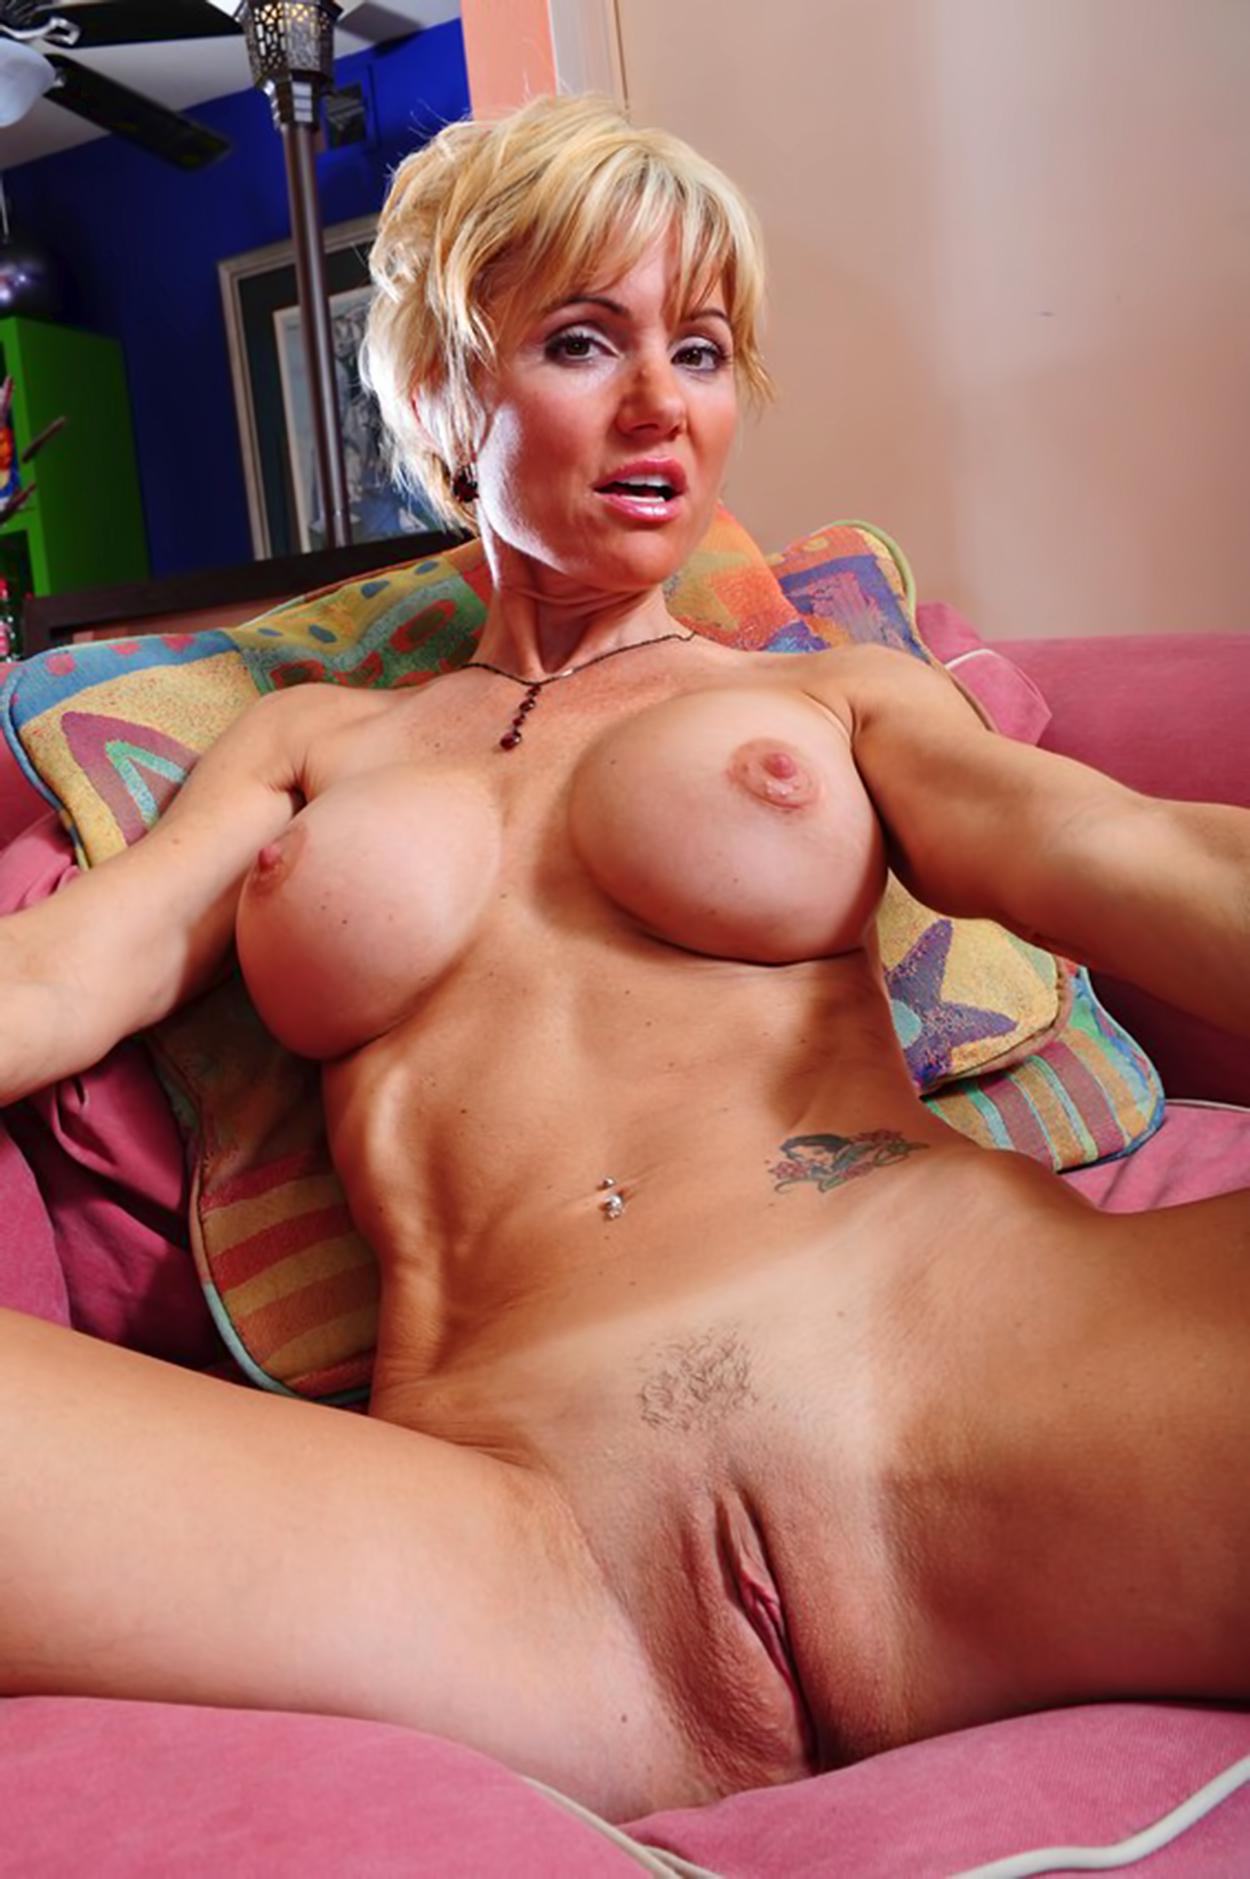 Mature women bra girdle